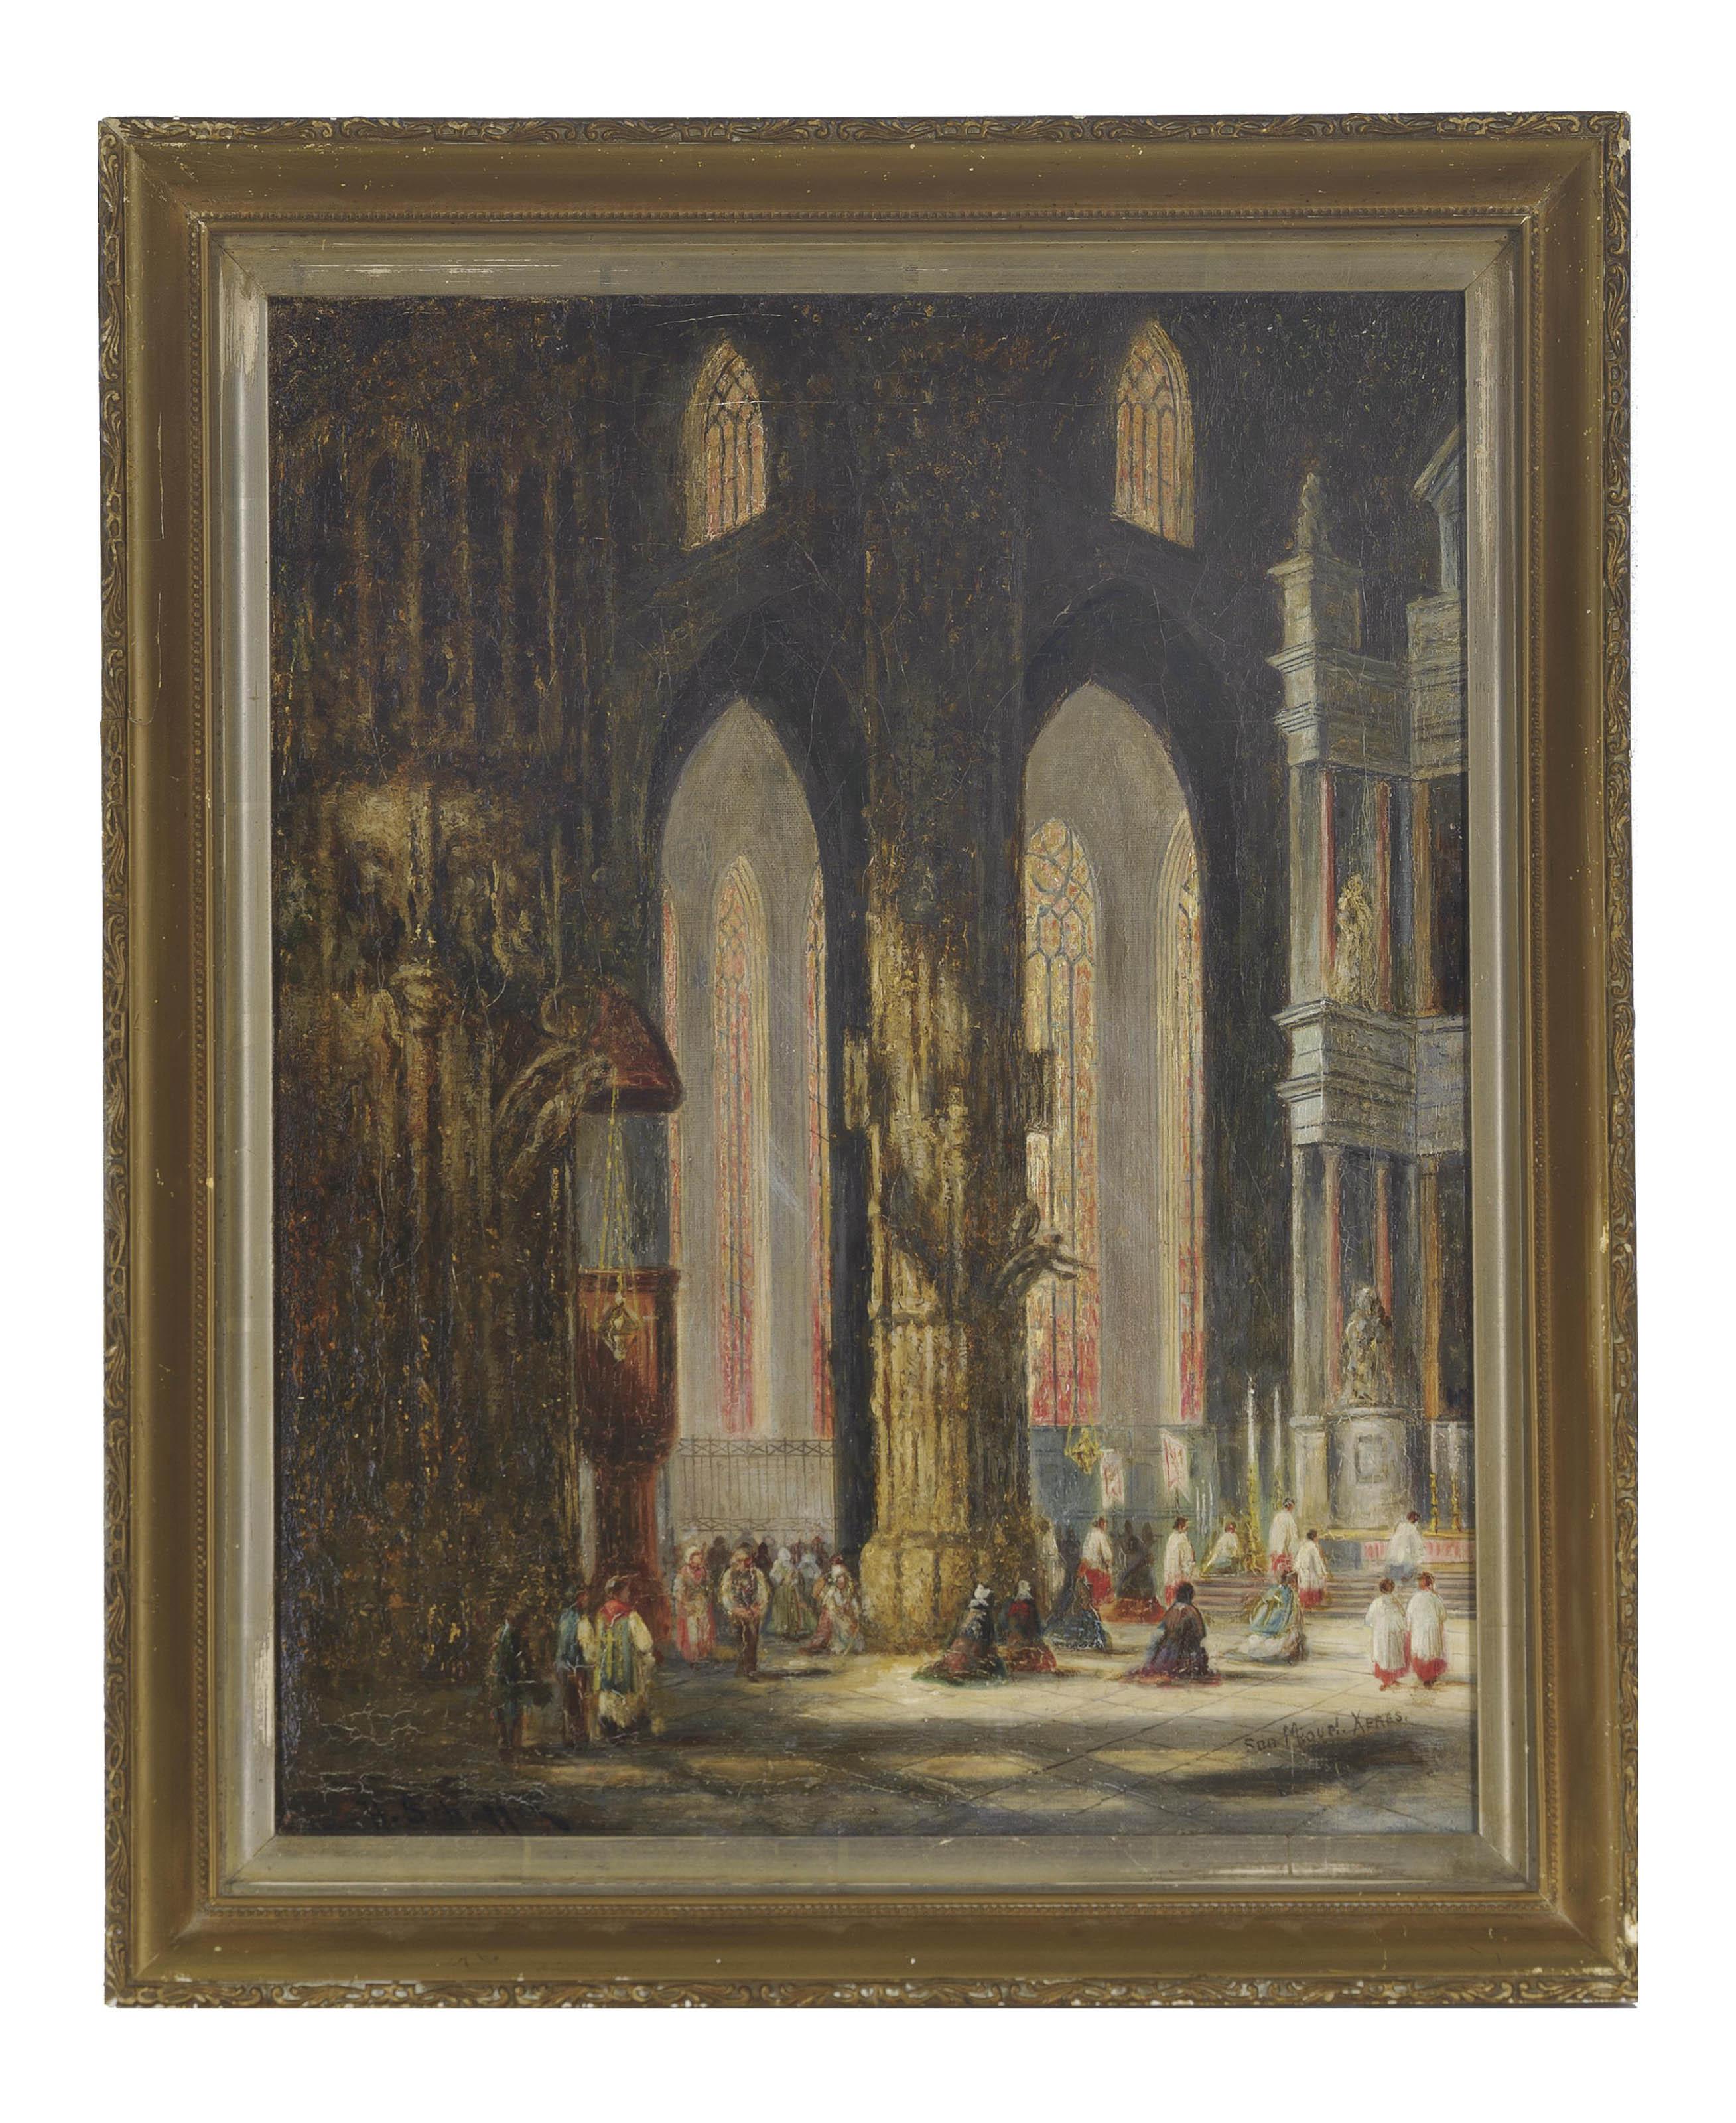 Scenes in the Church of San Miguel, Xeres de la Fronterra